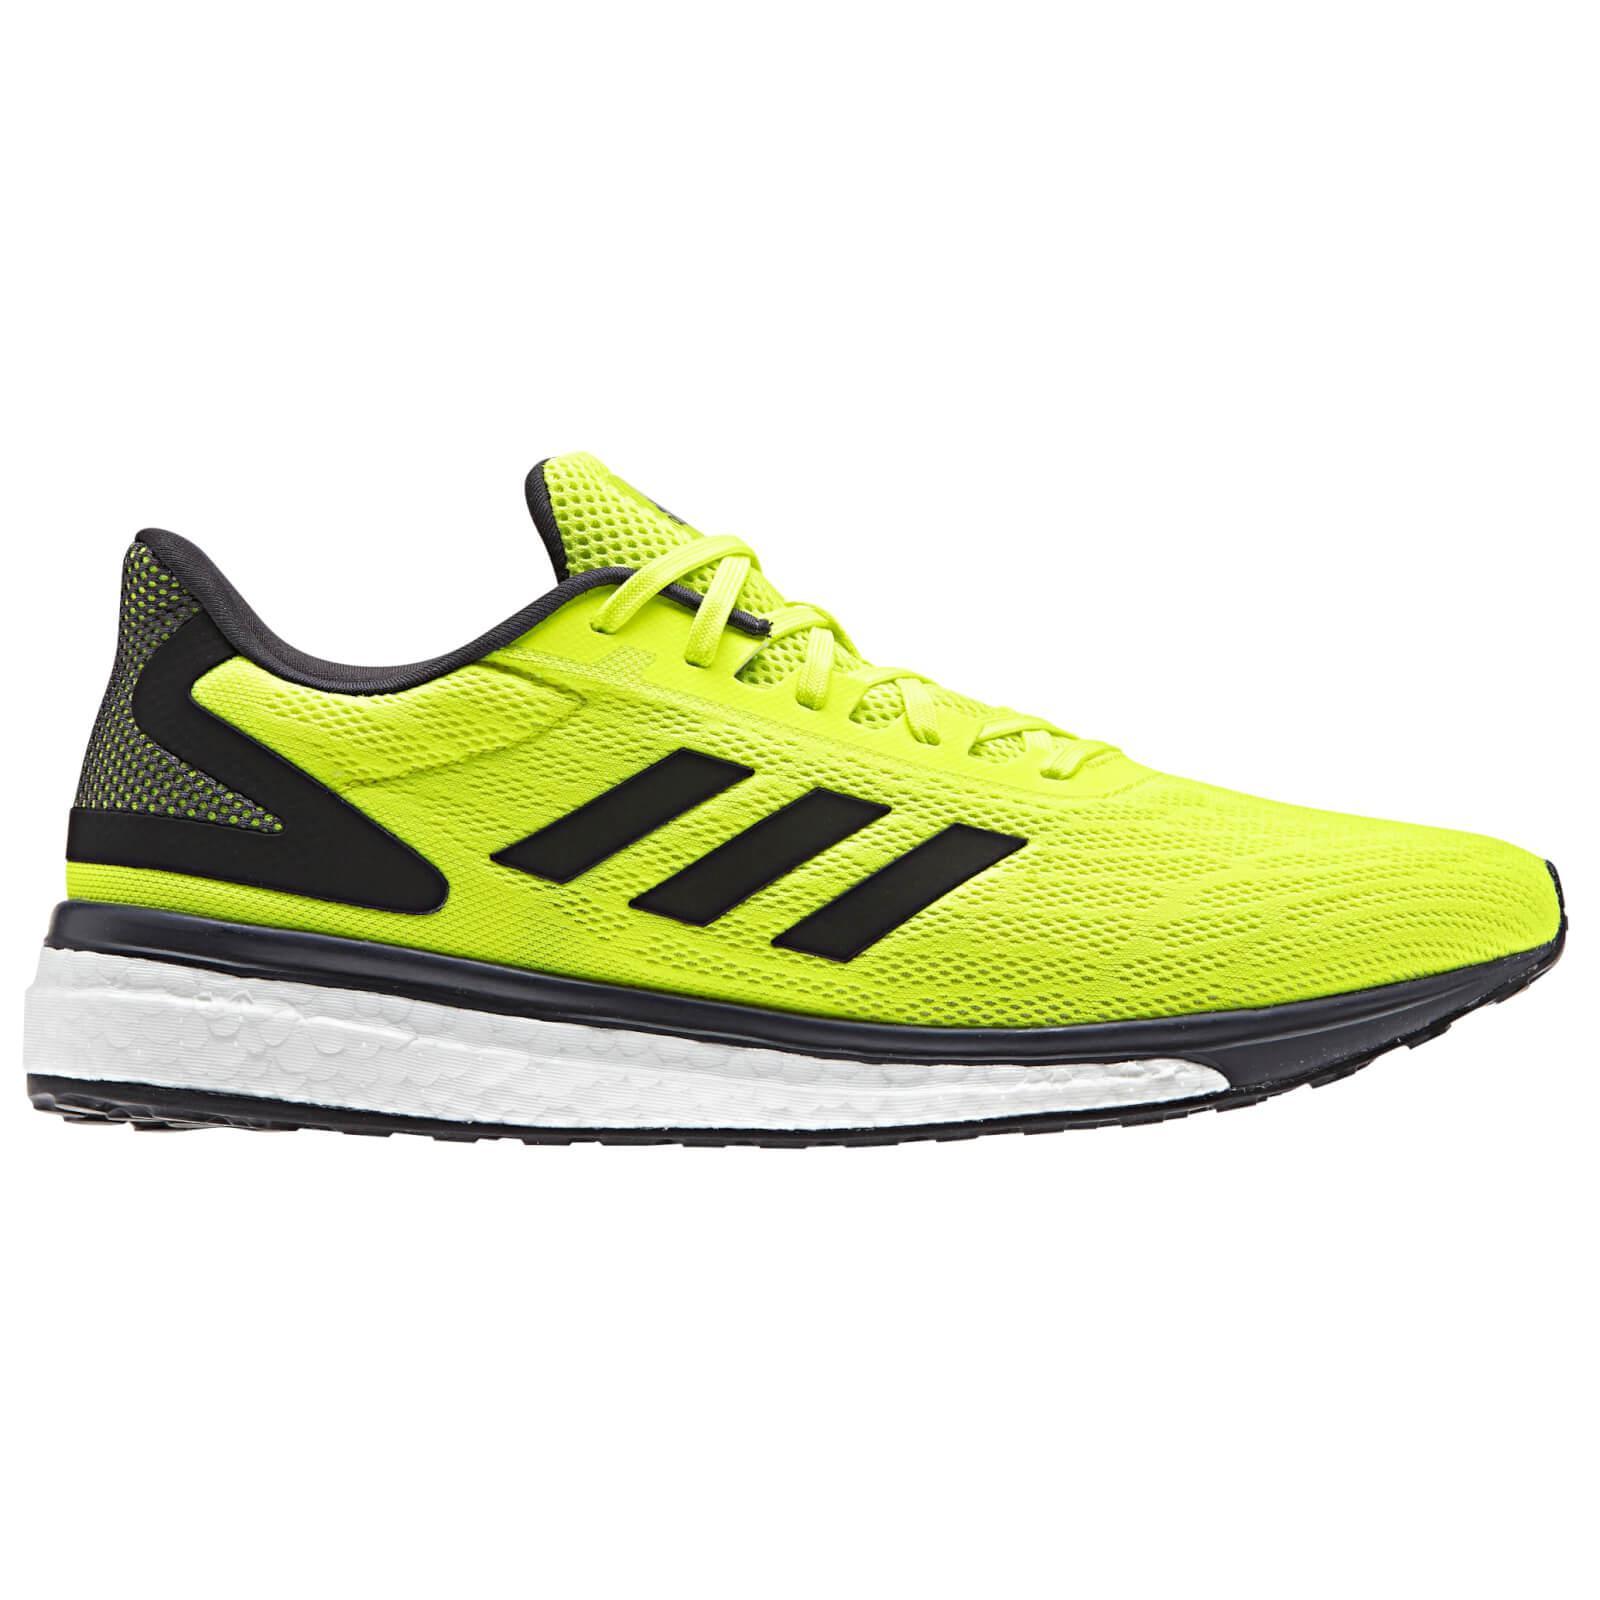 best cheap c5910 3f941 ... low cost lyst adidas response light zapatillas zapatillas en adidas  amarillo hombre para hombre f627a4f relaxcity